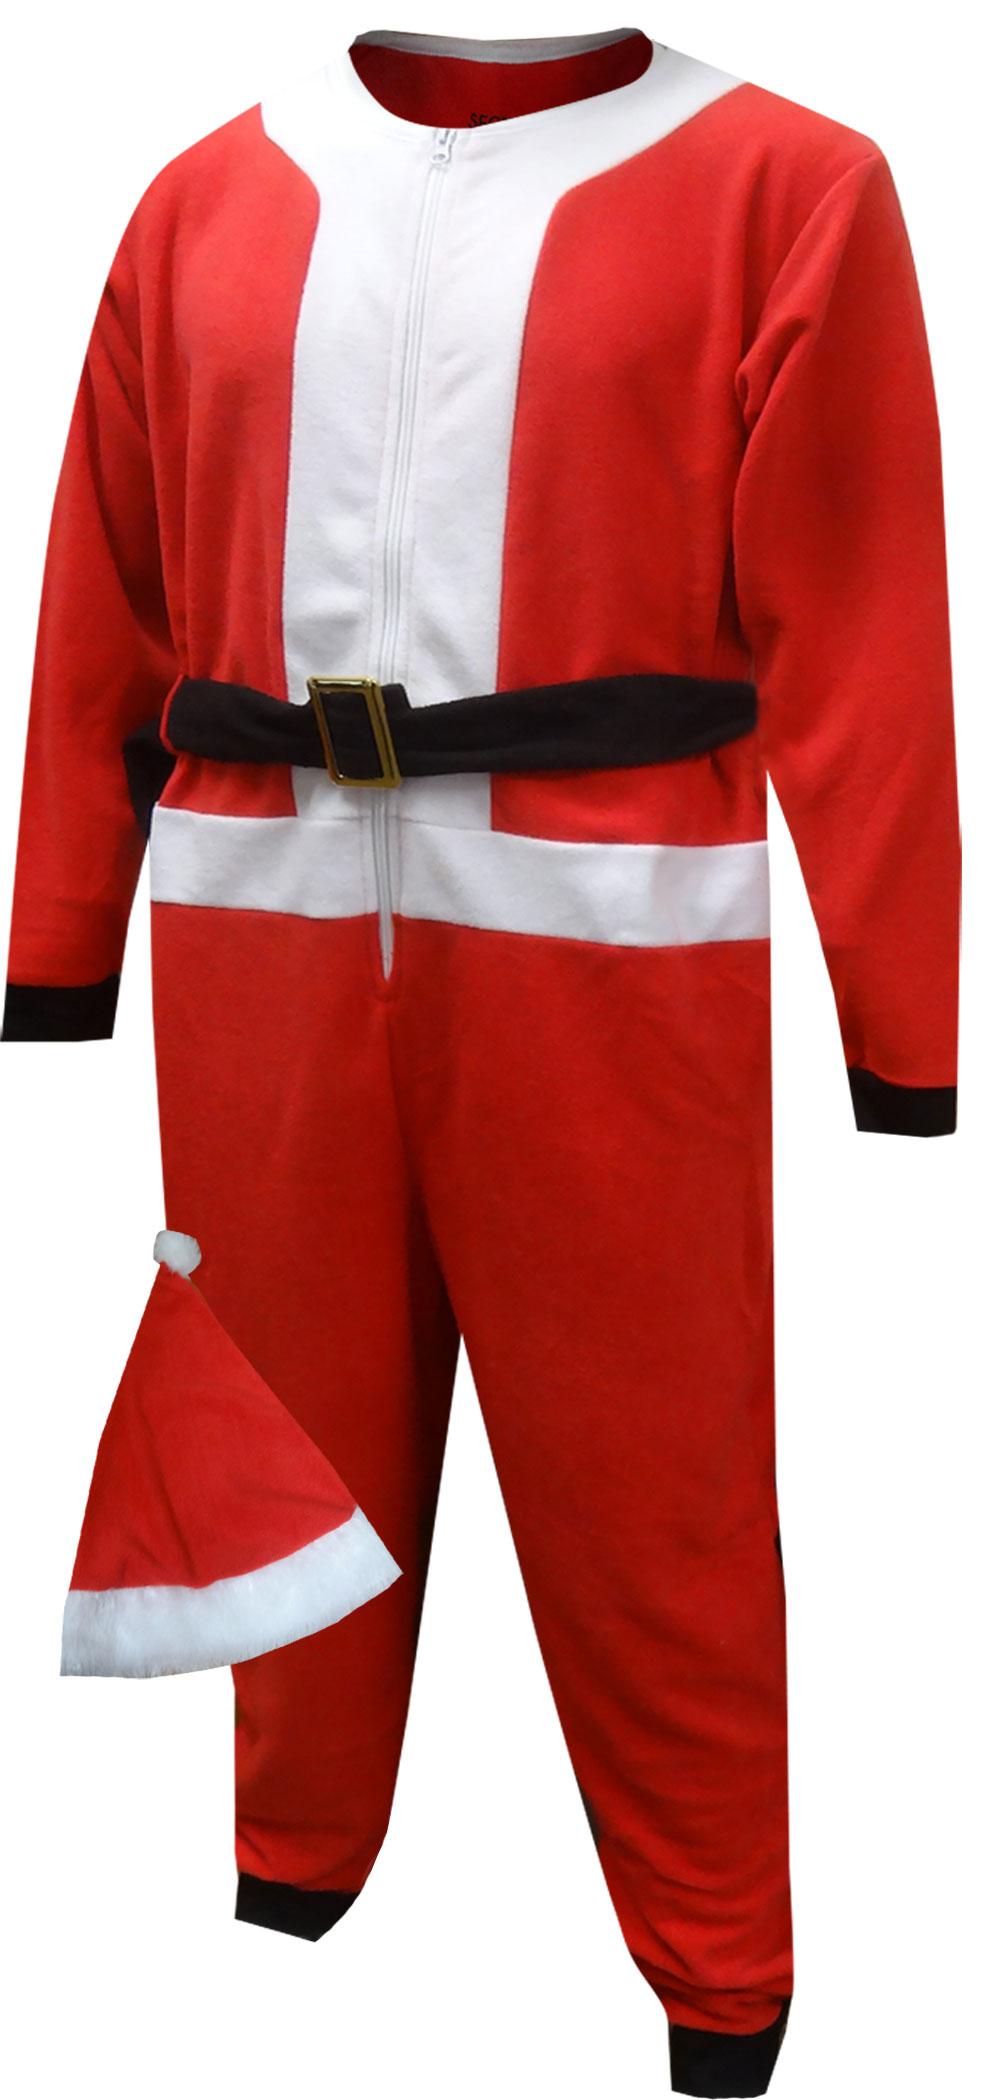 Image of Santa Suit Fleece Men's One Piece Pajama with Hat for men